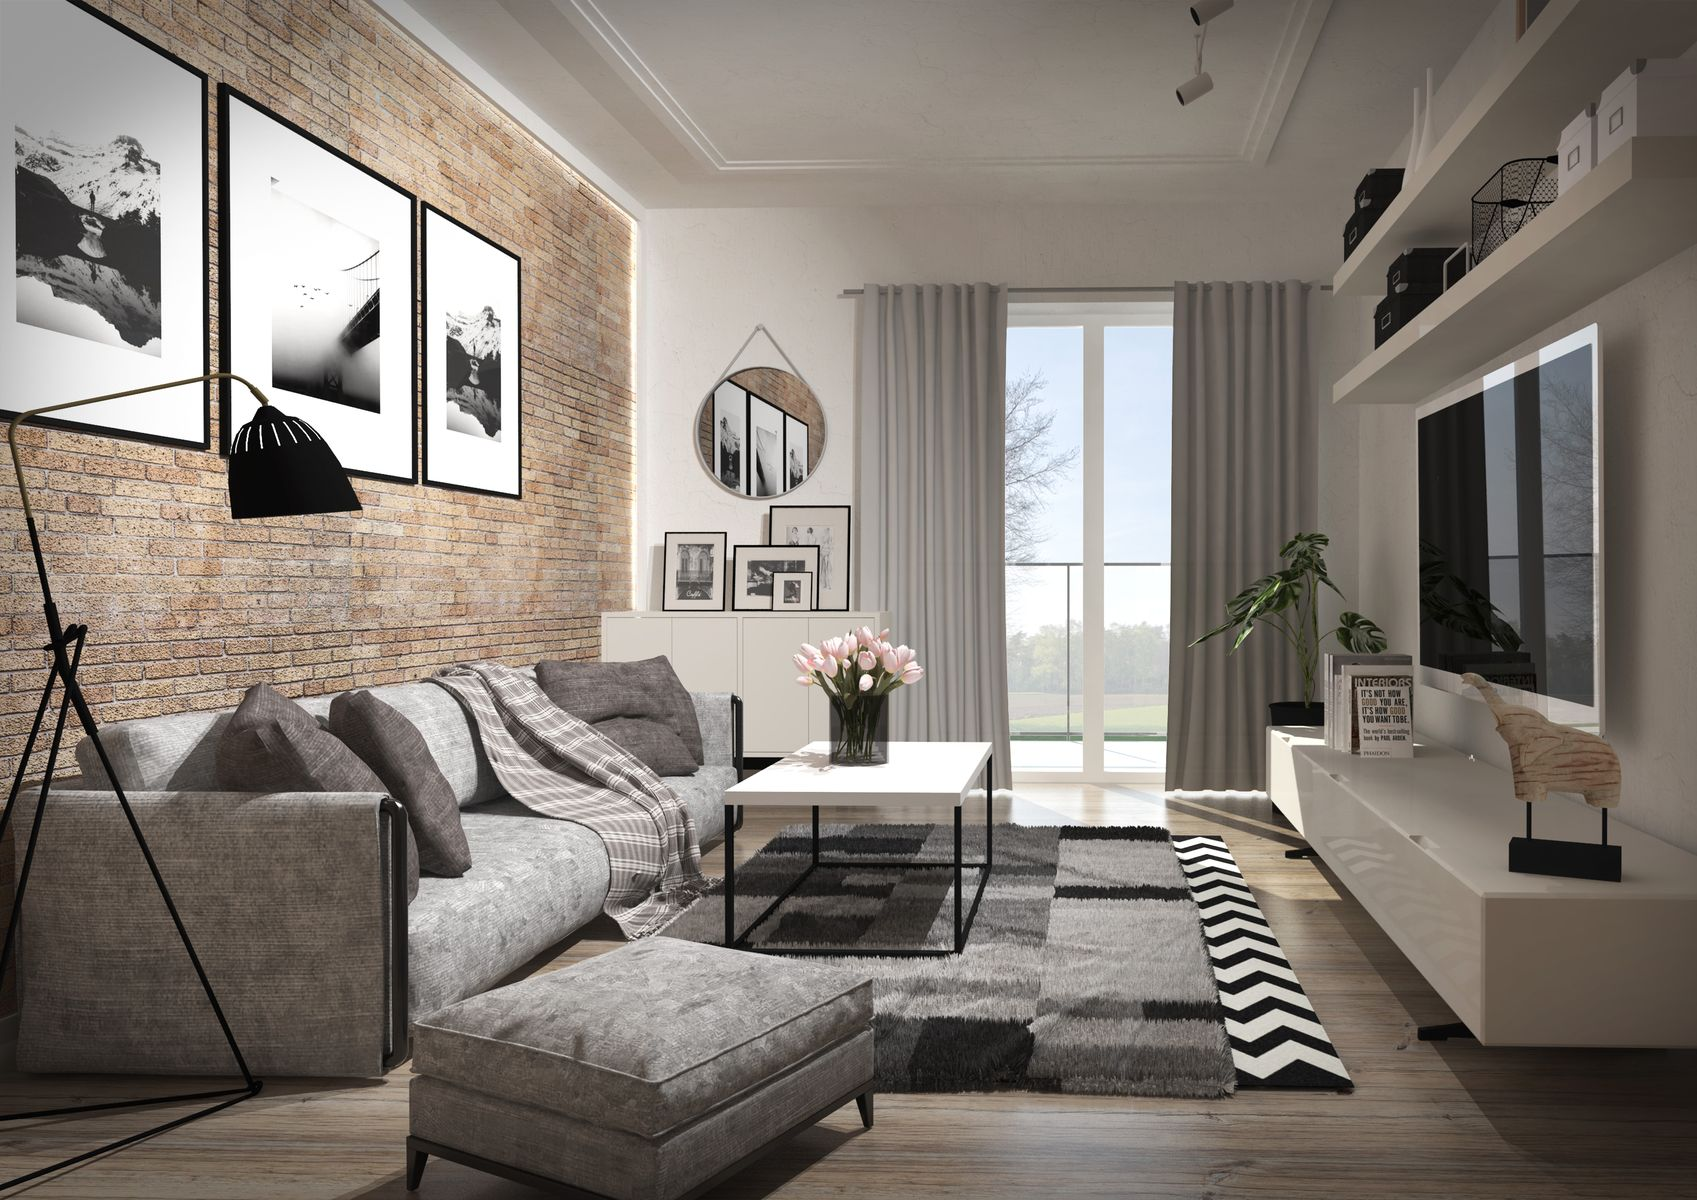 Smulsko Apartamenty